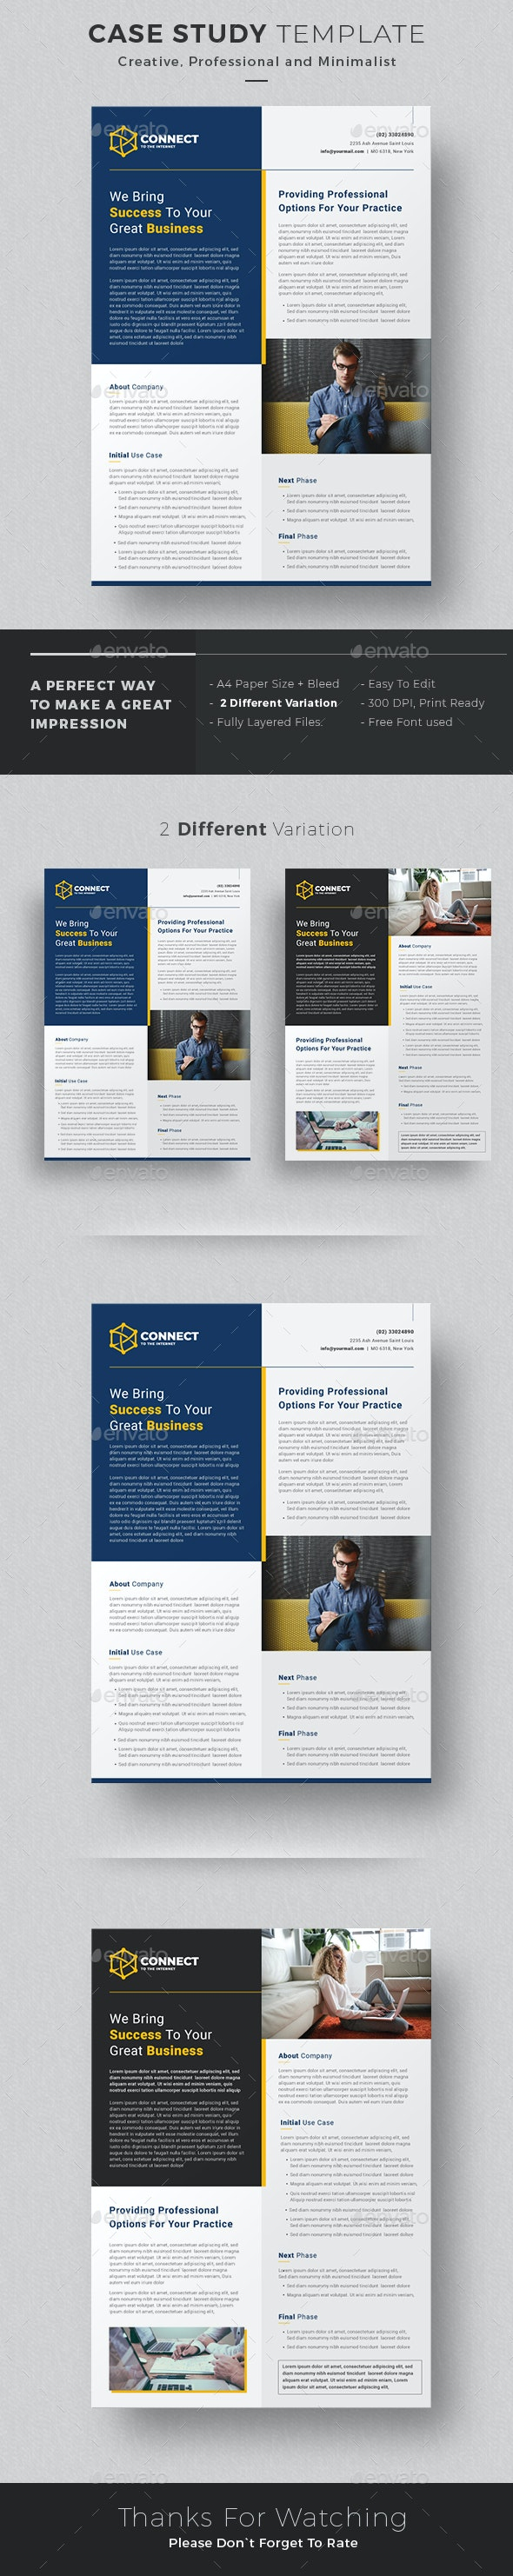 Case Study Flyer - Corporate Flyers